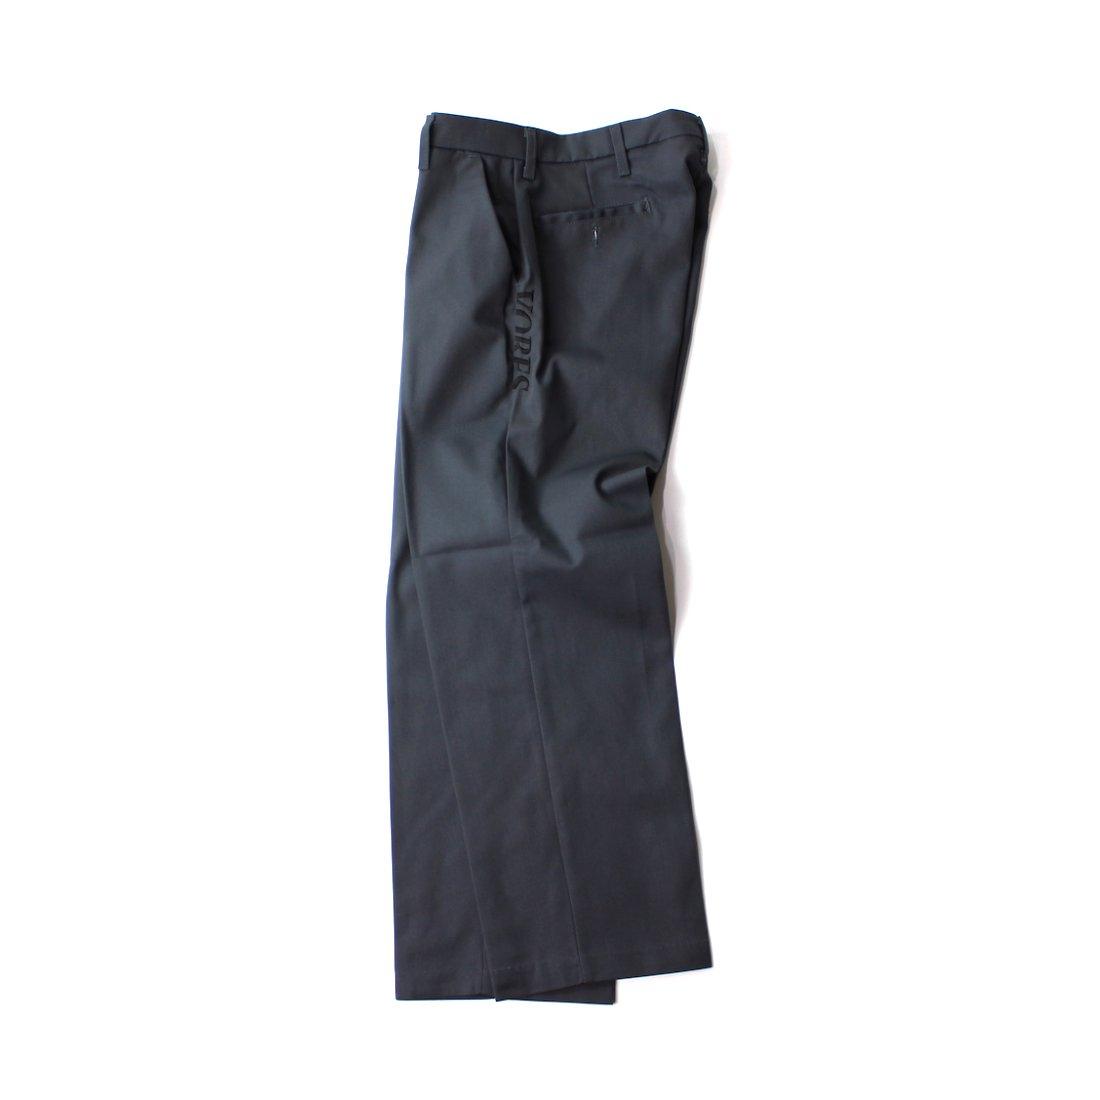 【VORES】Harf Cut Logo Work Pants - Charcoal